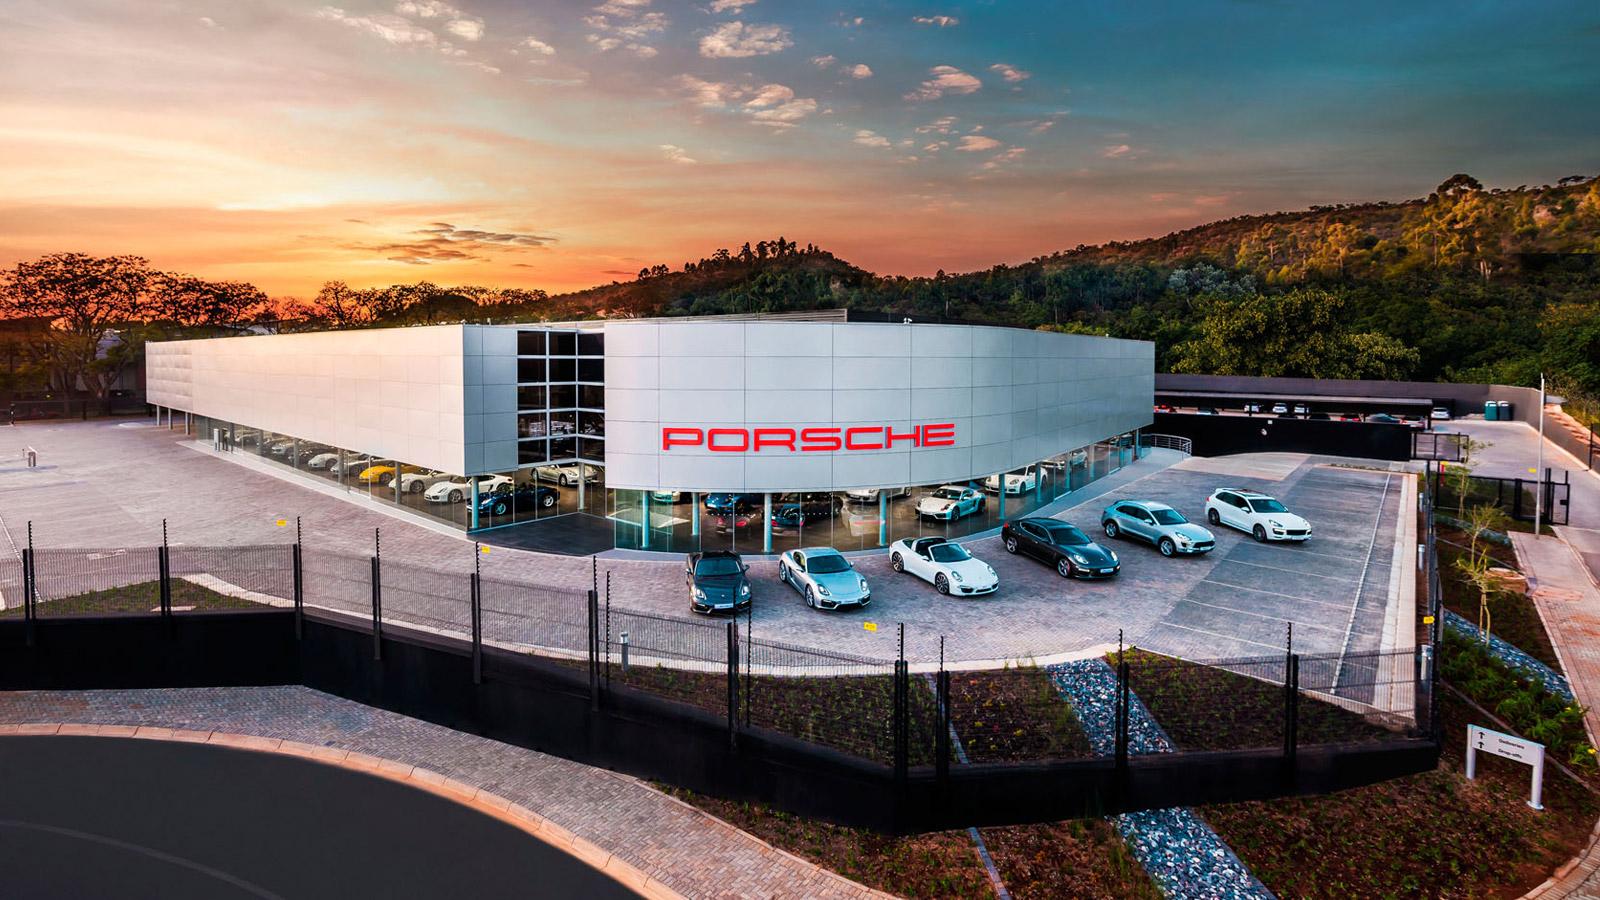 Porsche - Порше Центр Претория